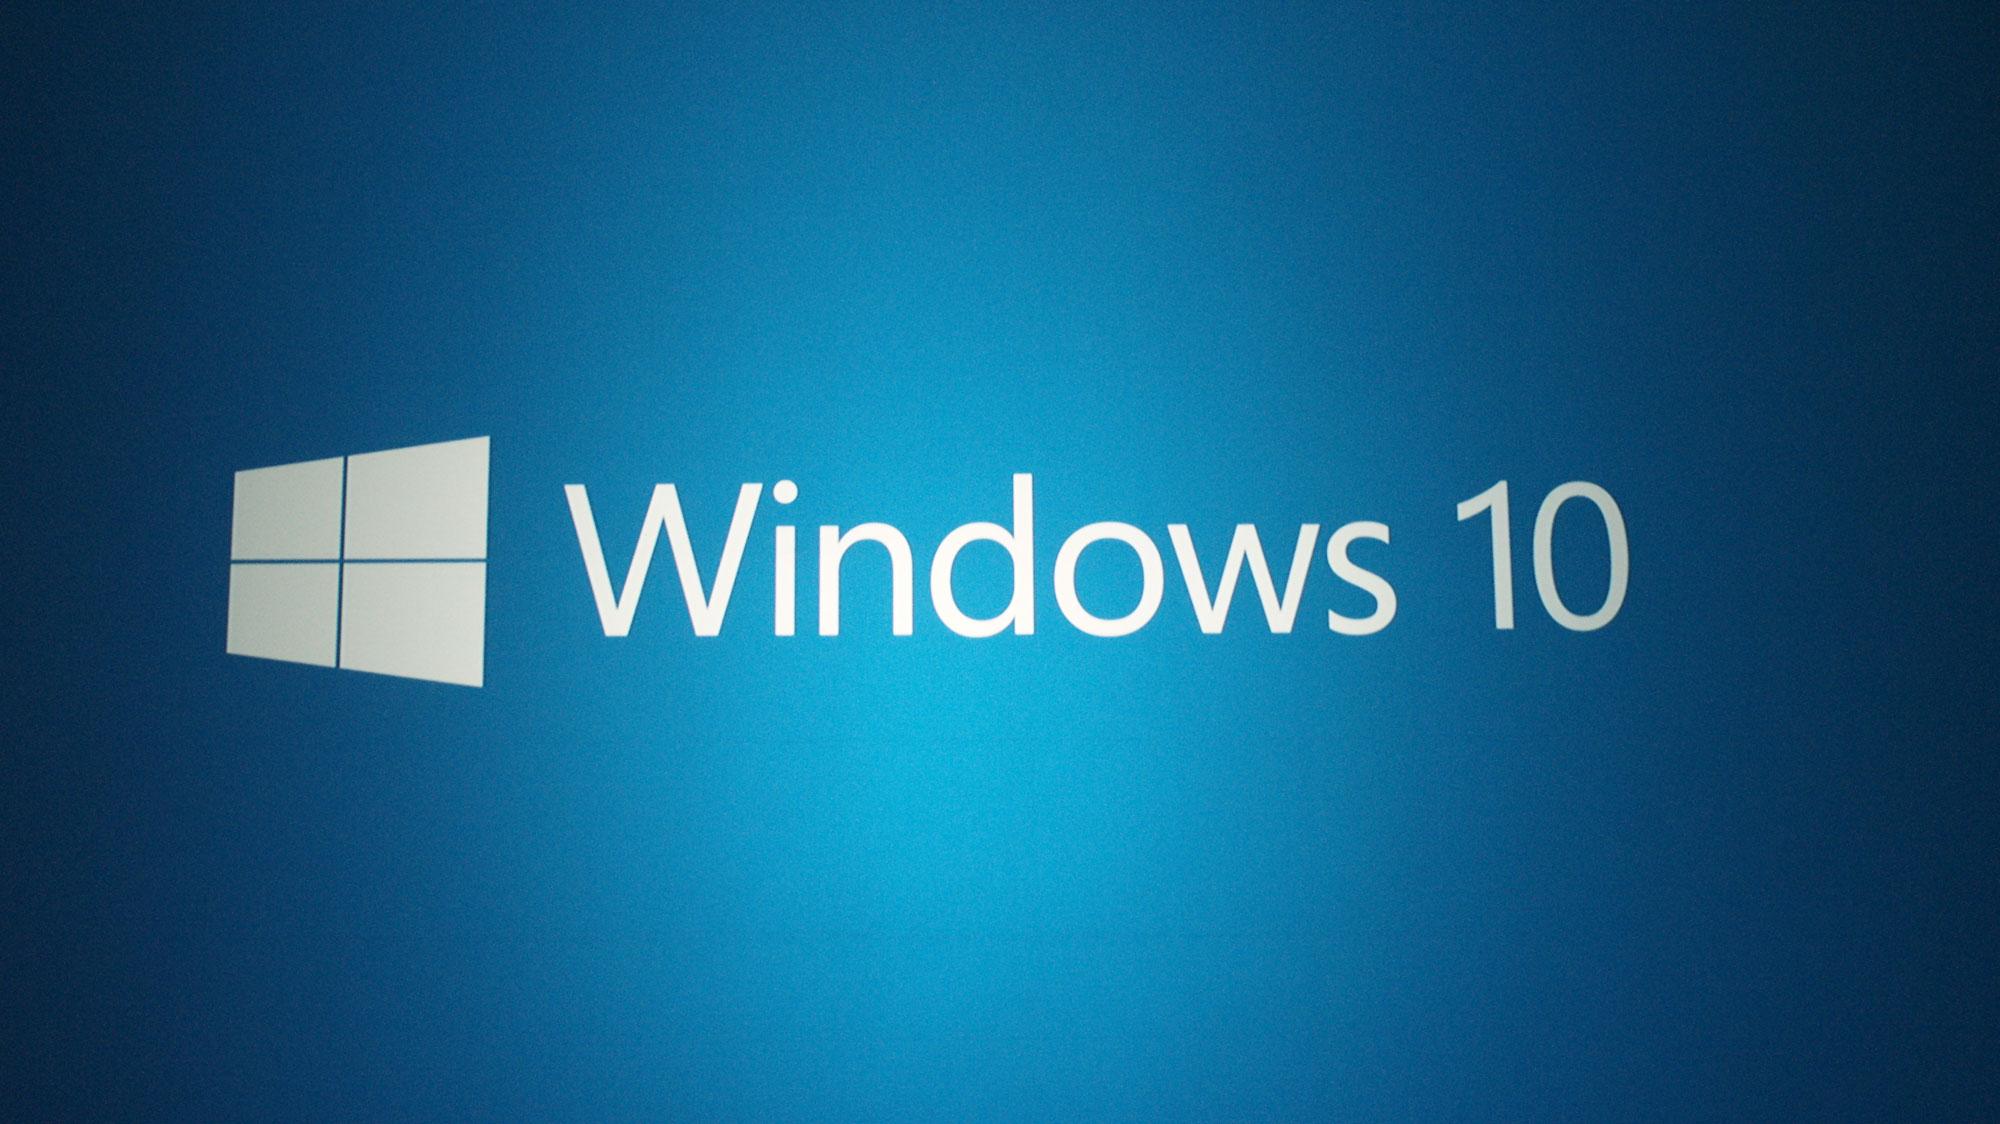 Windows 10 HD Wallpapers Hd Wallpapers 2000x1124